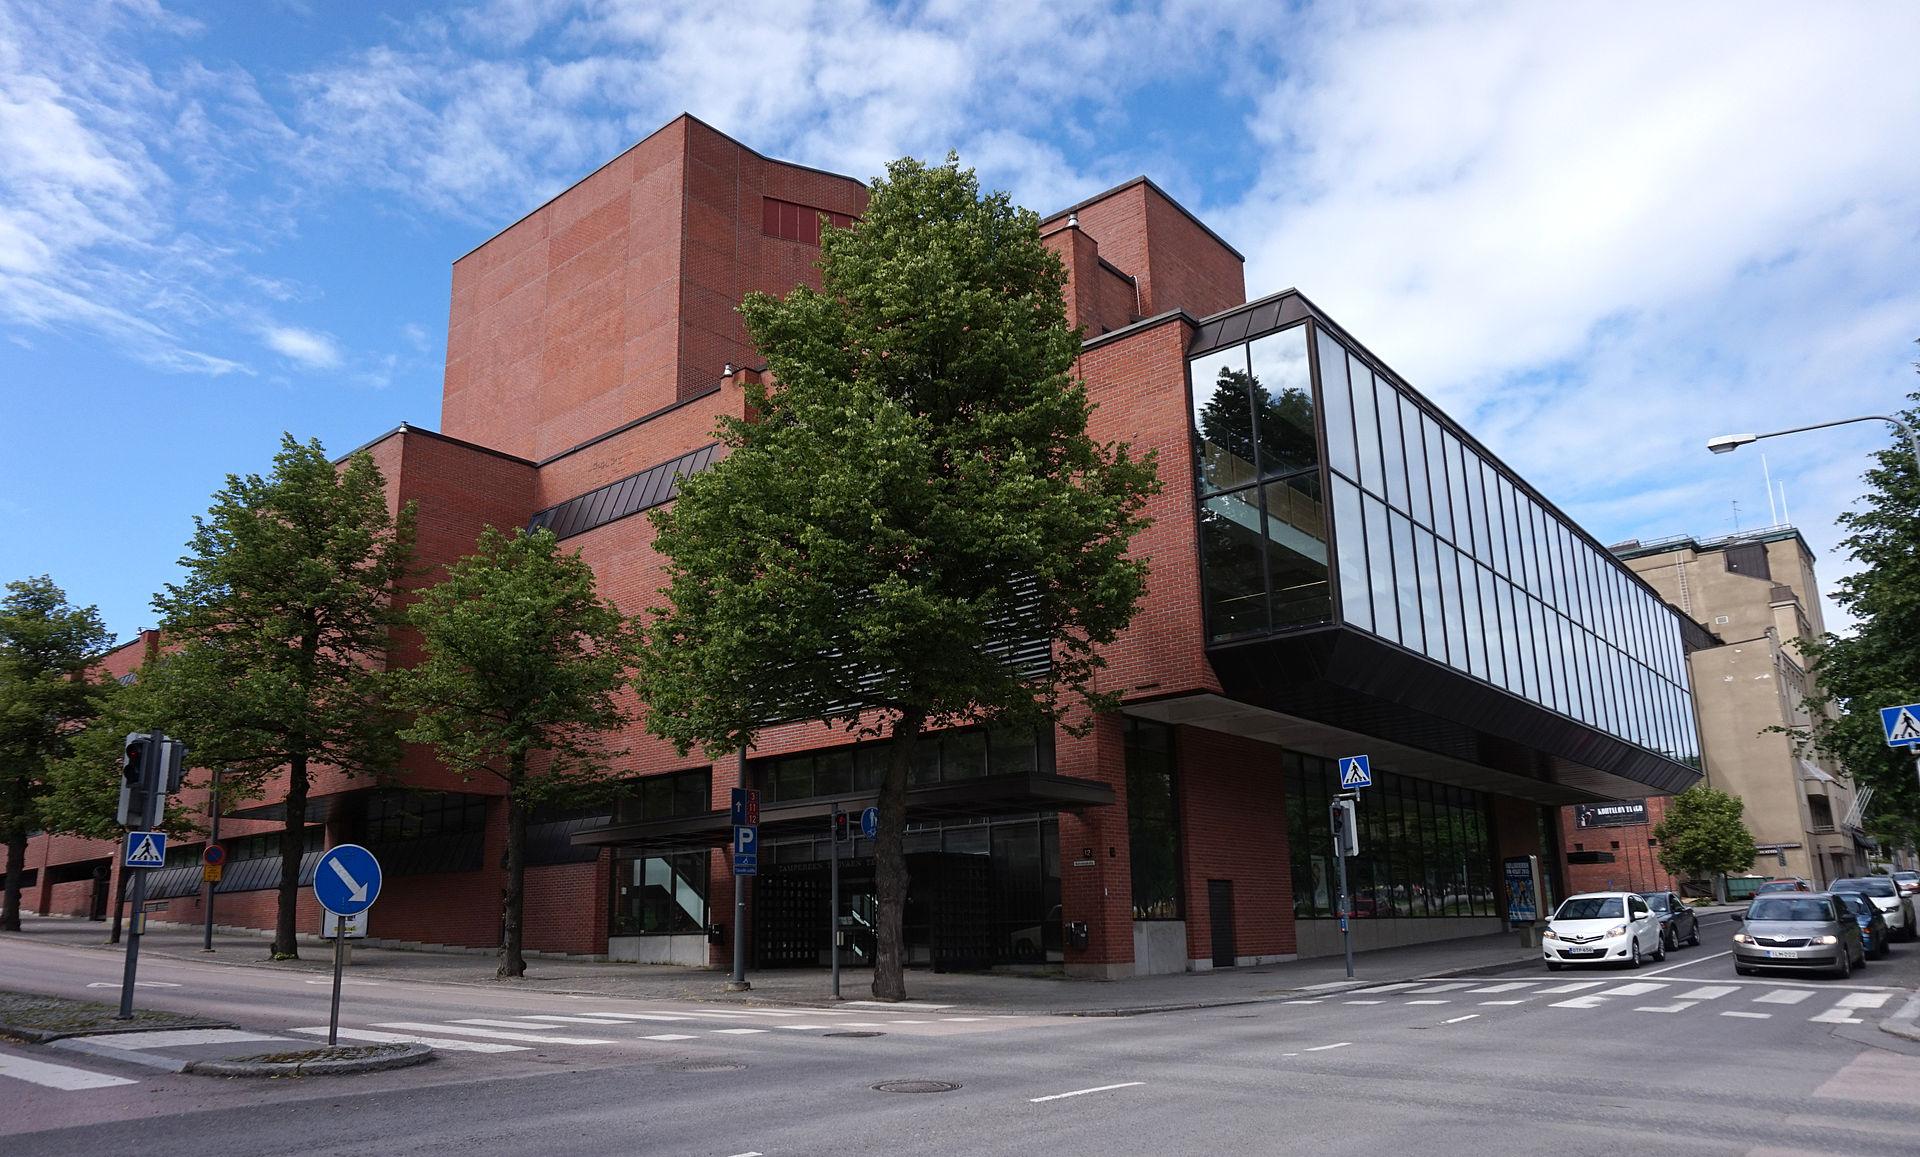 Tampereen Poliisikoulu